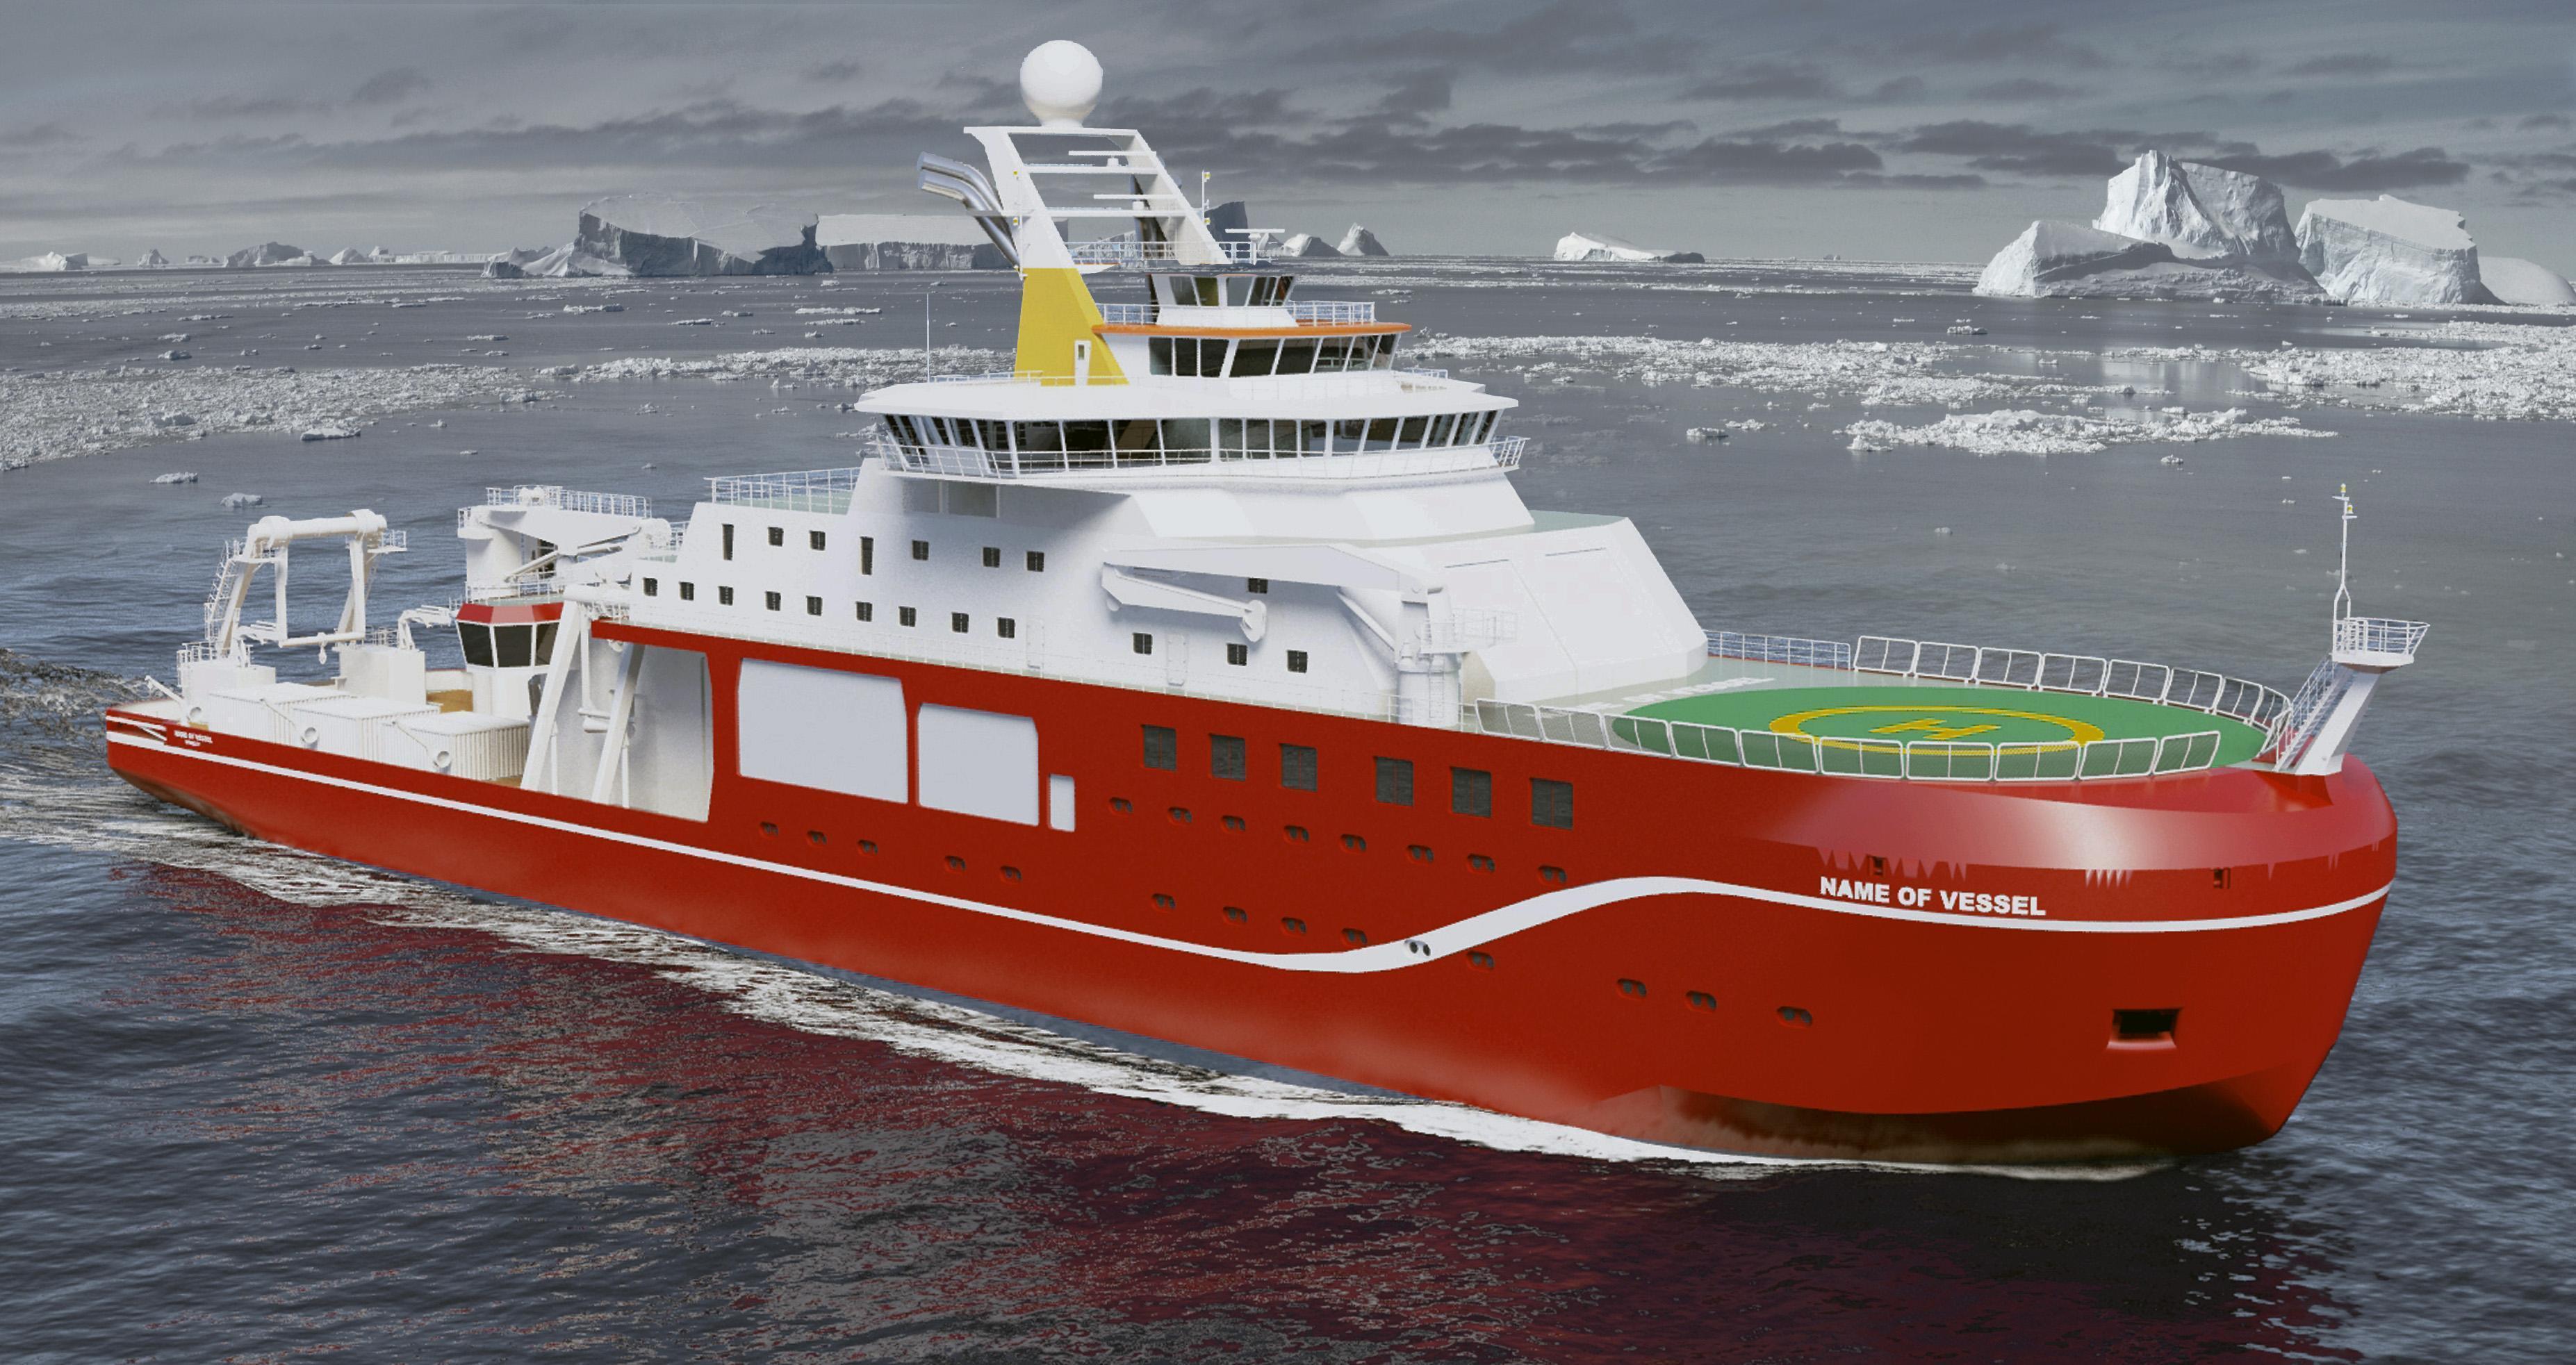 The NERC polar research ship